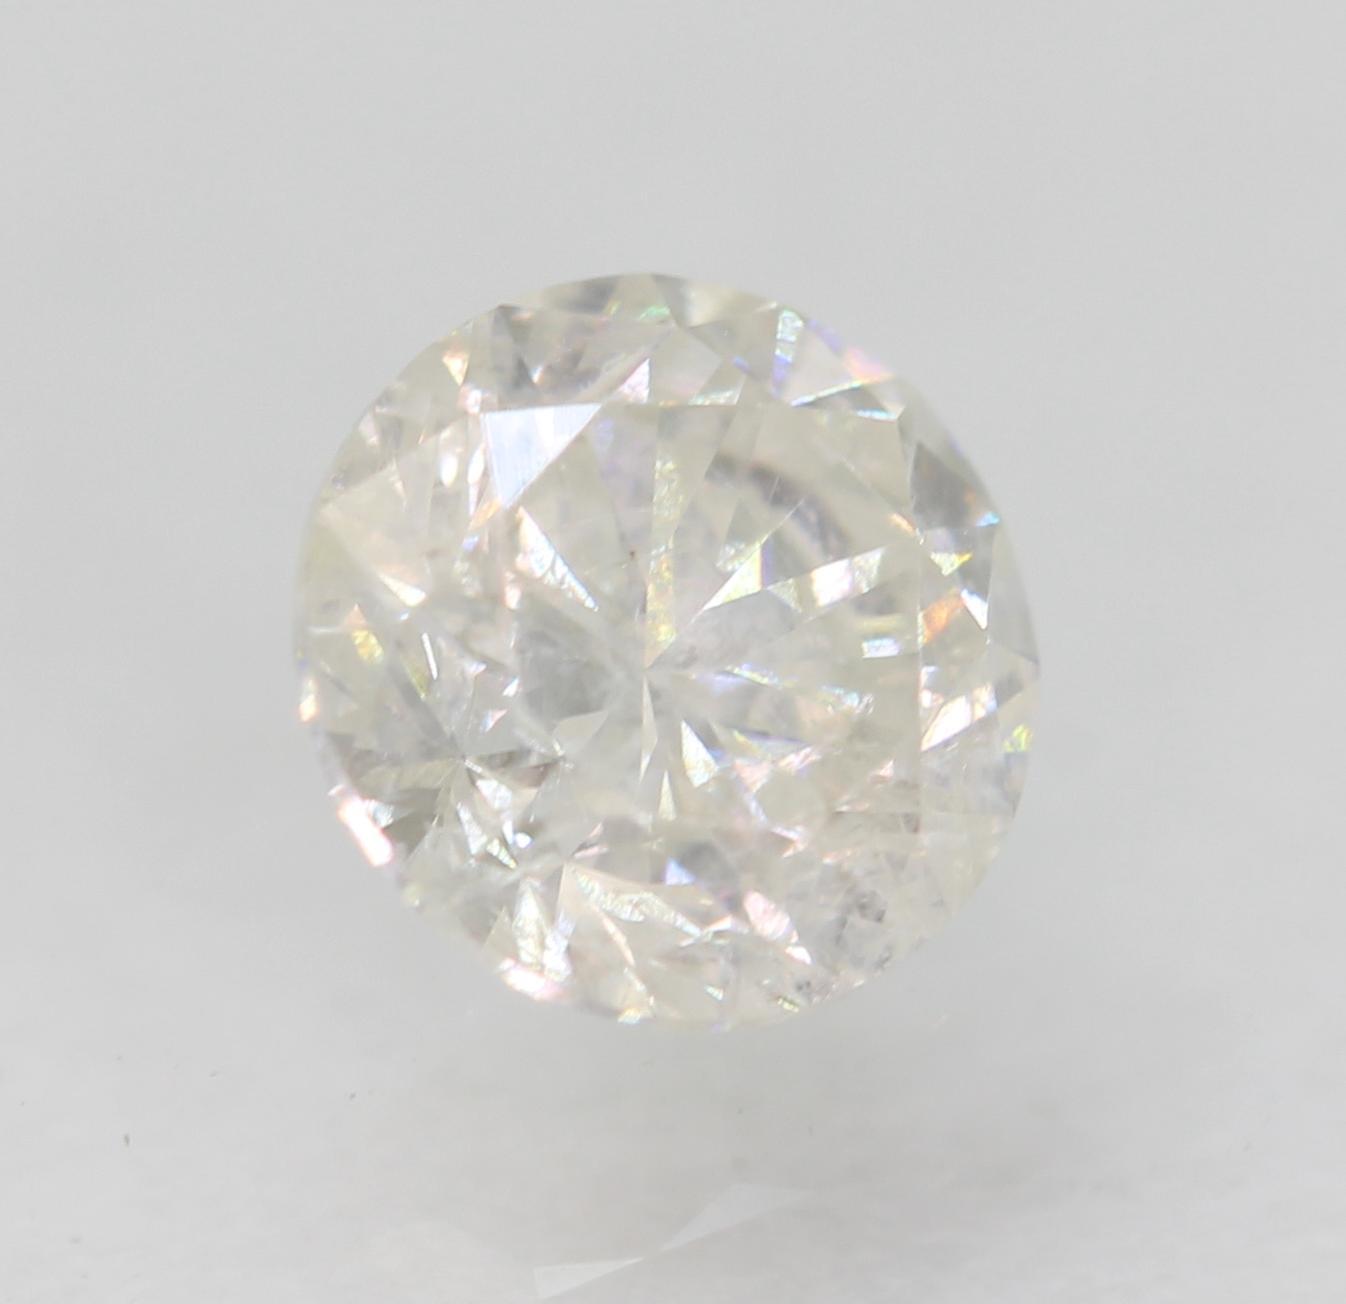 Certified 0.51 Carat F SI2 Round Brilliant Enhanced Natural Diamond 4.95m EX CUT